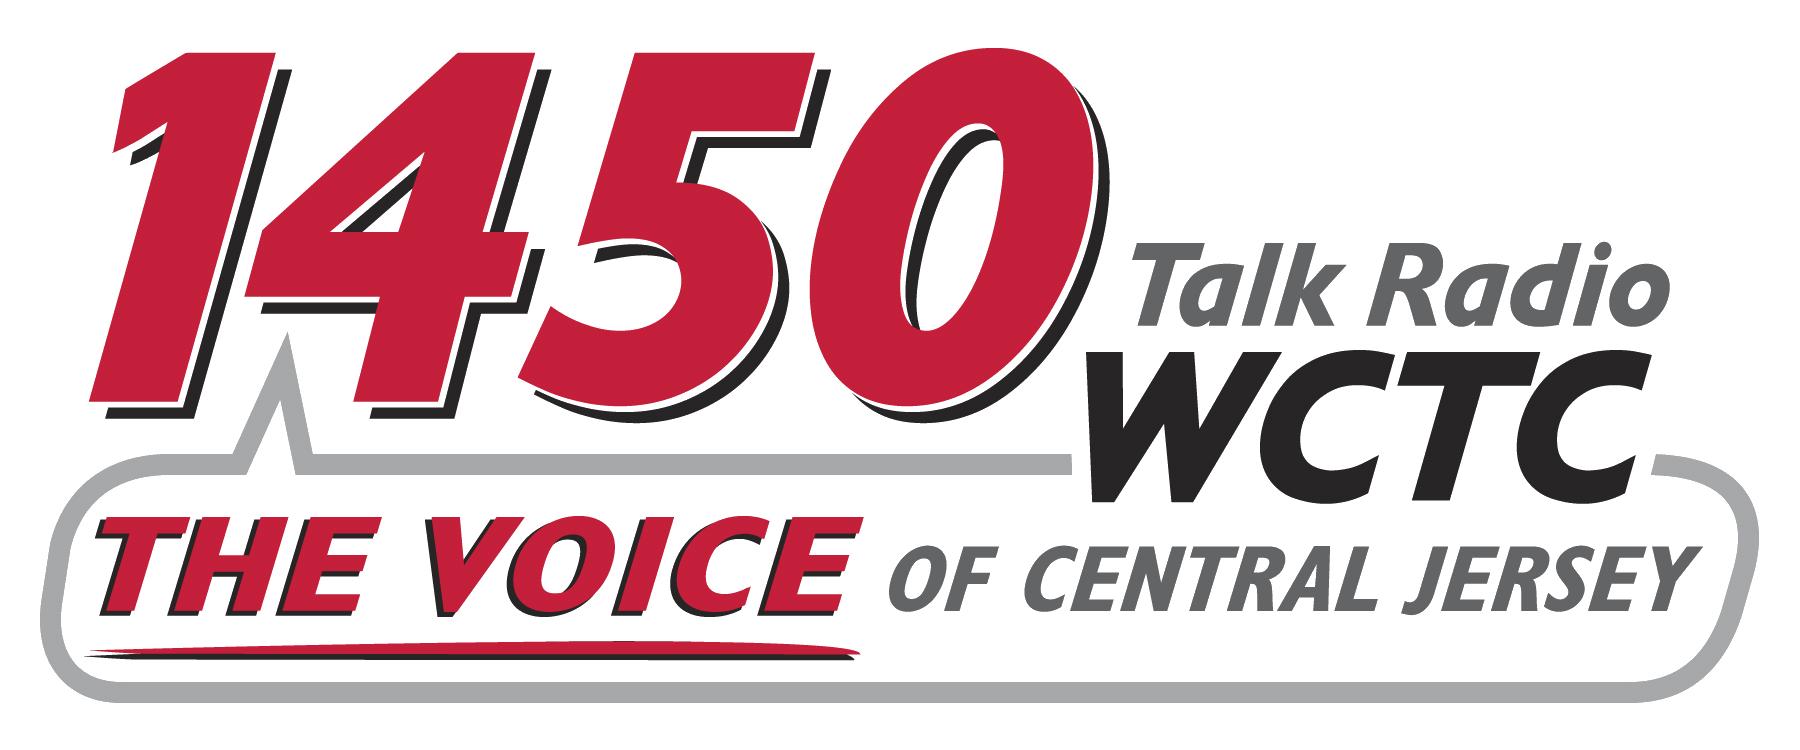 WCTC AM 1450.png